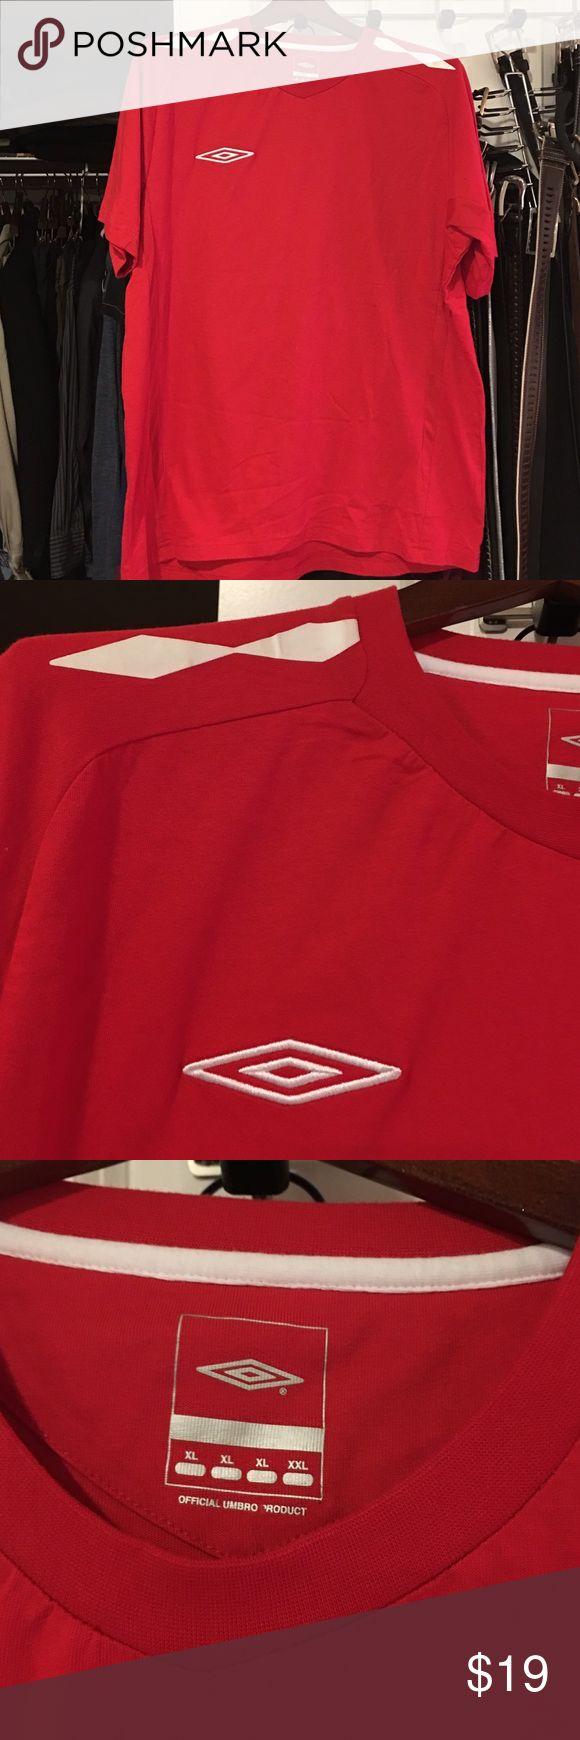 Unbro shirt Red umbro shirt new without tags cotton umbro Shirts Tees - Short Sleeve